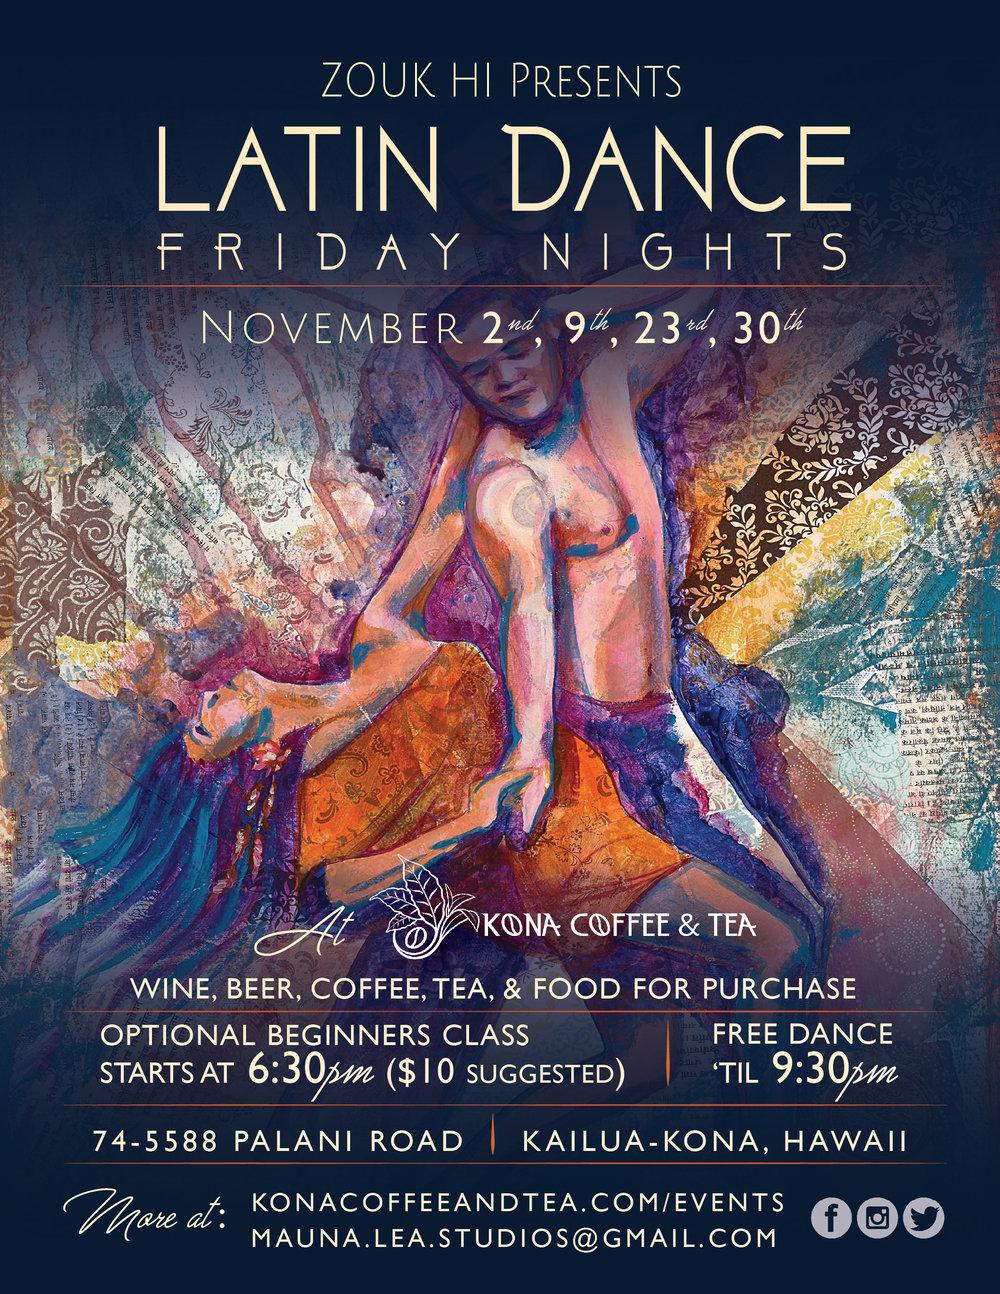 Latin Dance Friday Nights November 2018_Kona Coffee and Tea-01-01.jpg